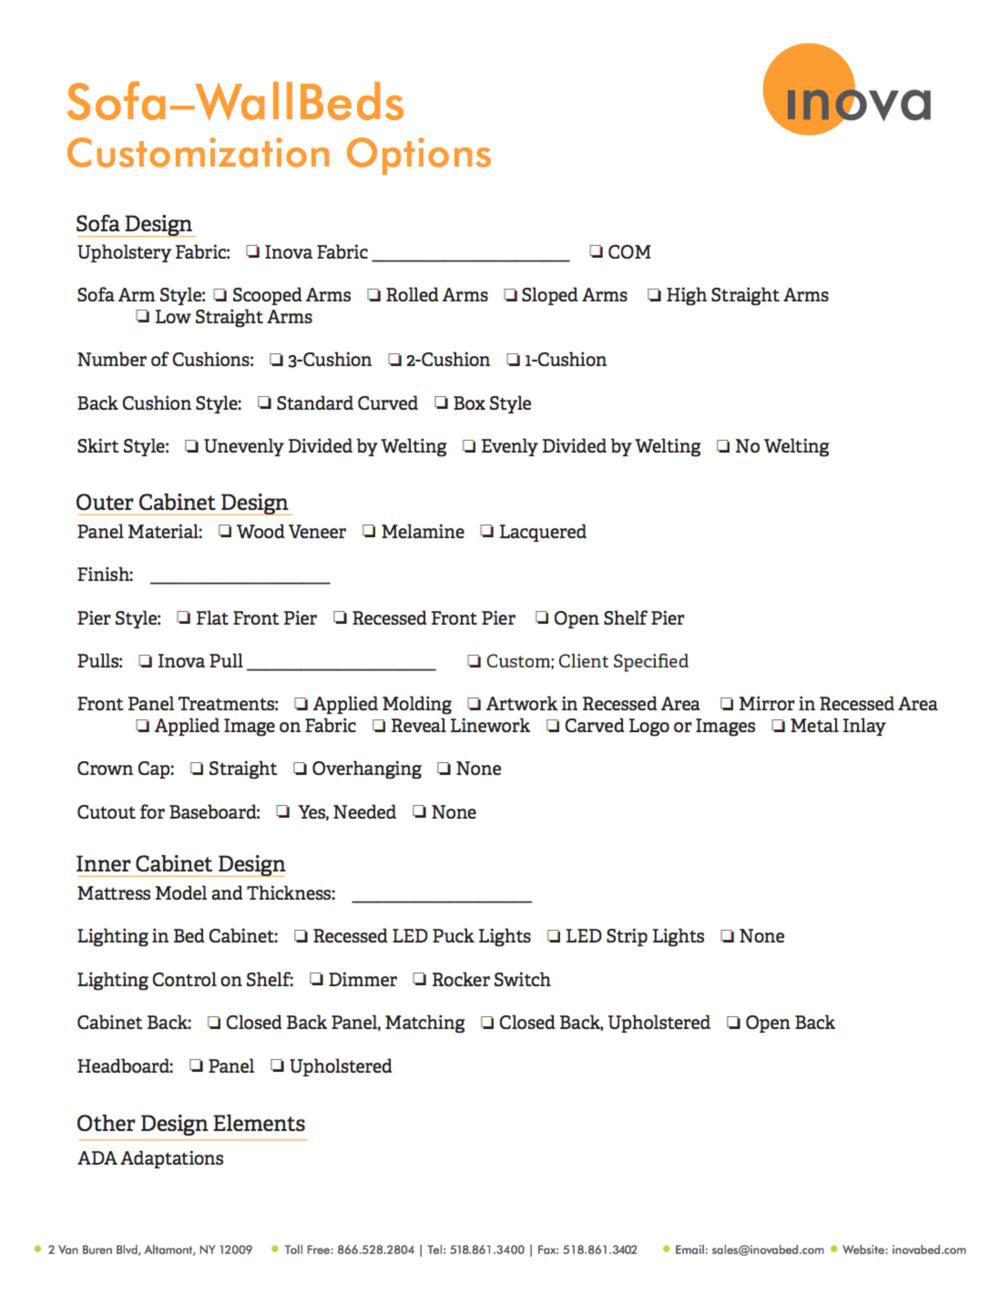 Sofa-WallBeds: Customization Options